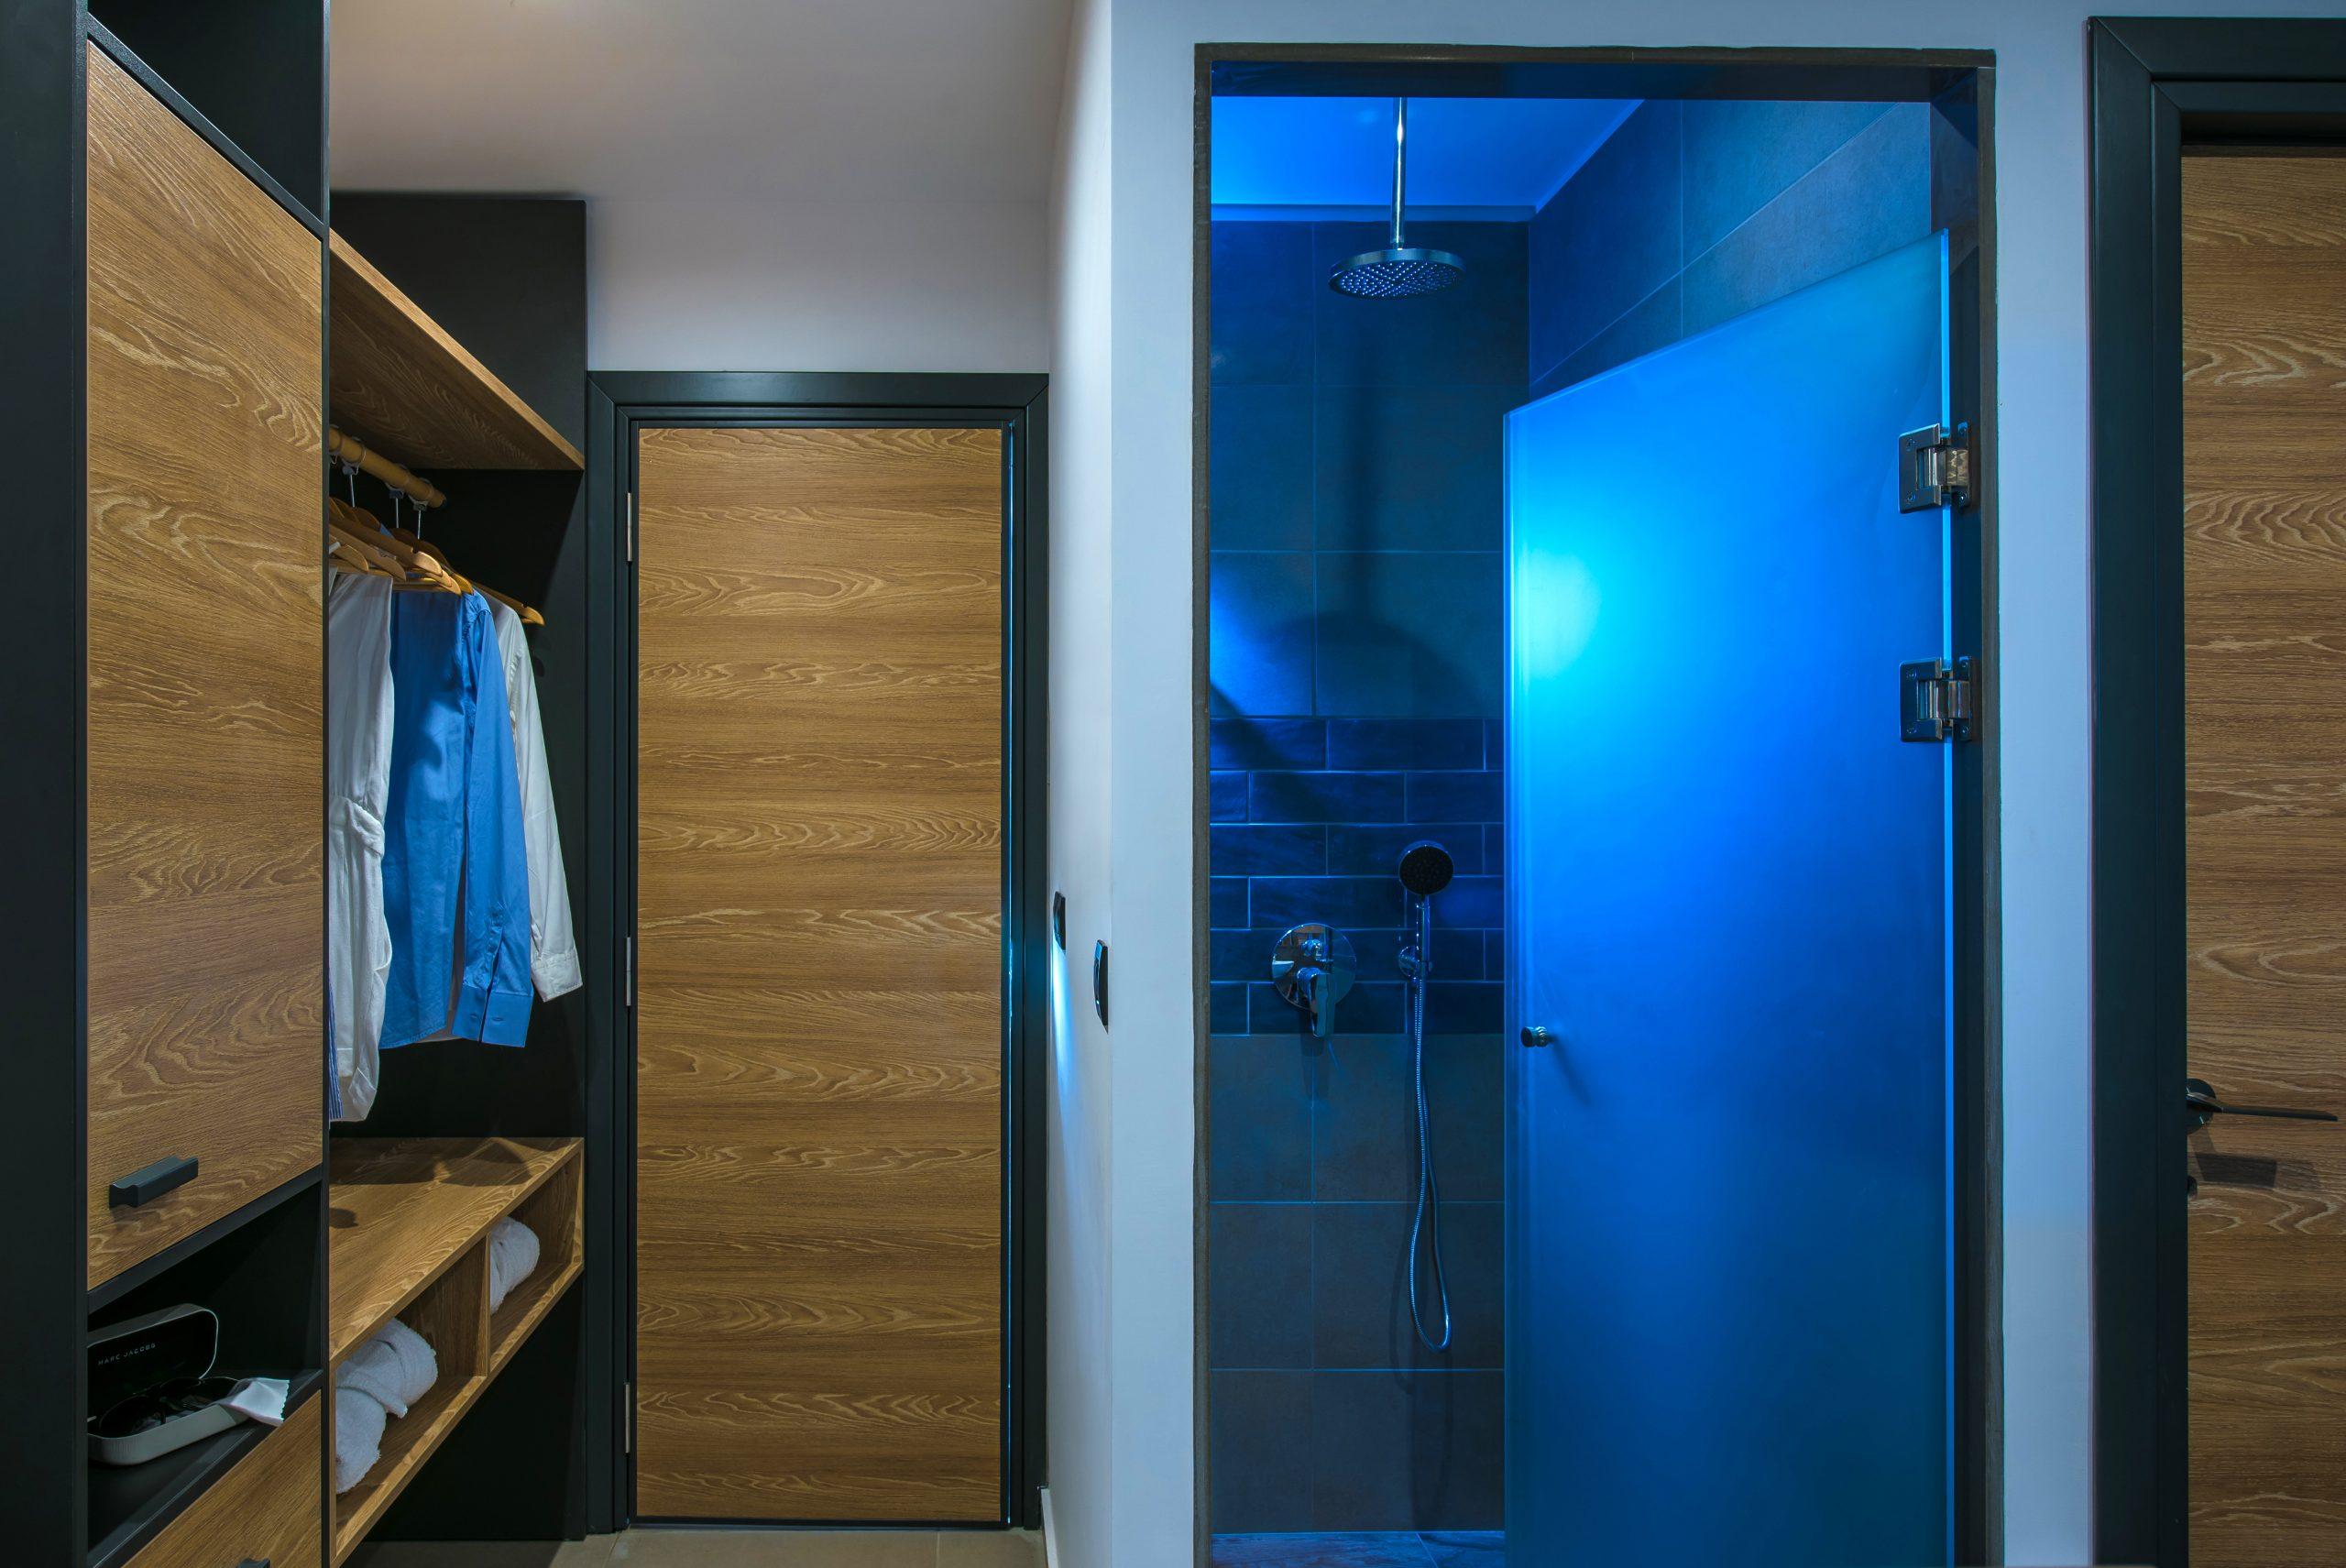 Superior double room with indoor jacuzzi